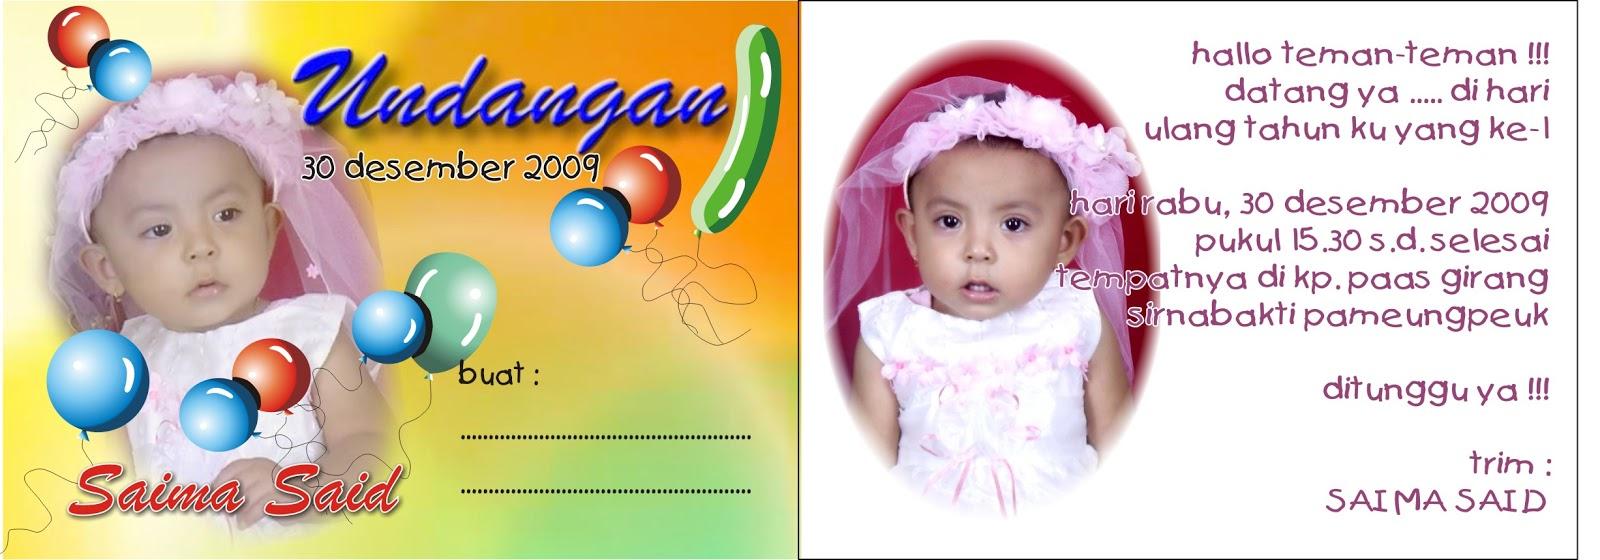 Kartu Undangan Kartu Undangan Ulang Tahun Anak Ukuran 10 4 X 7 2 Cm